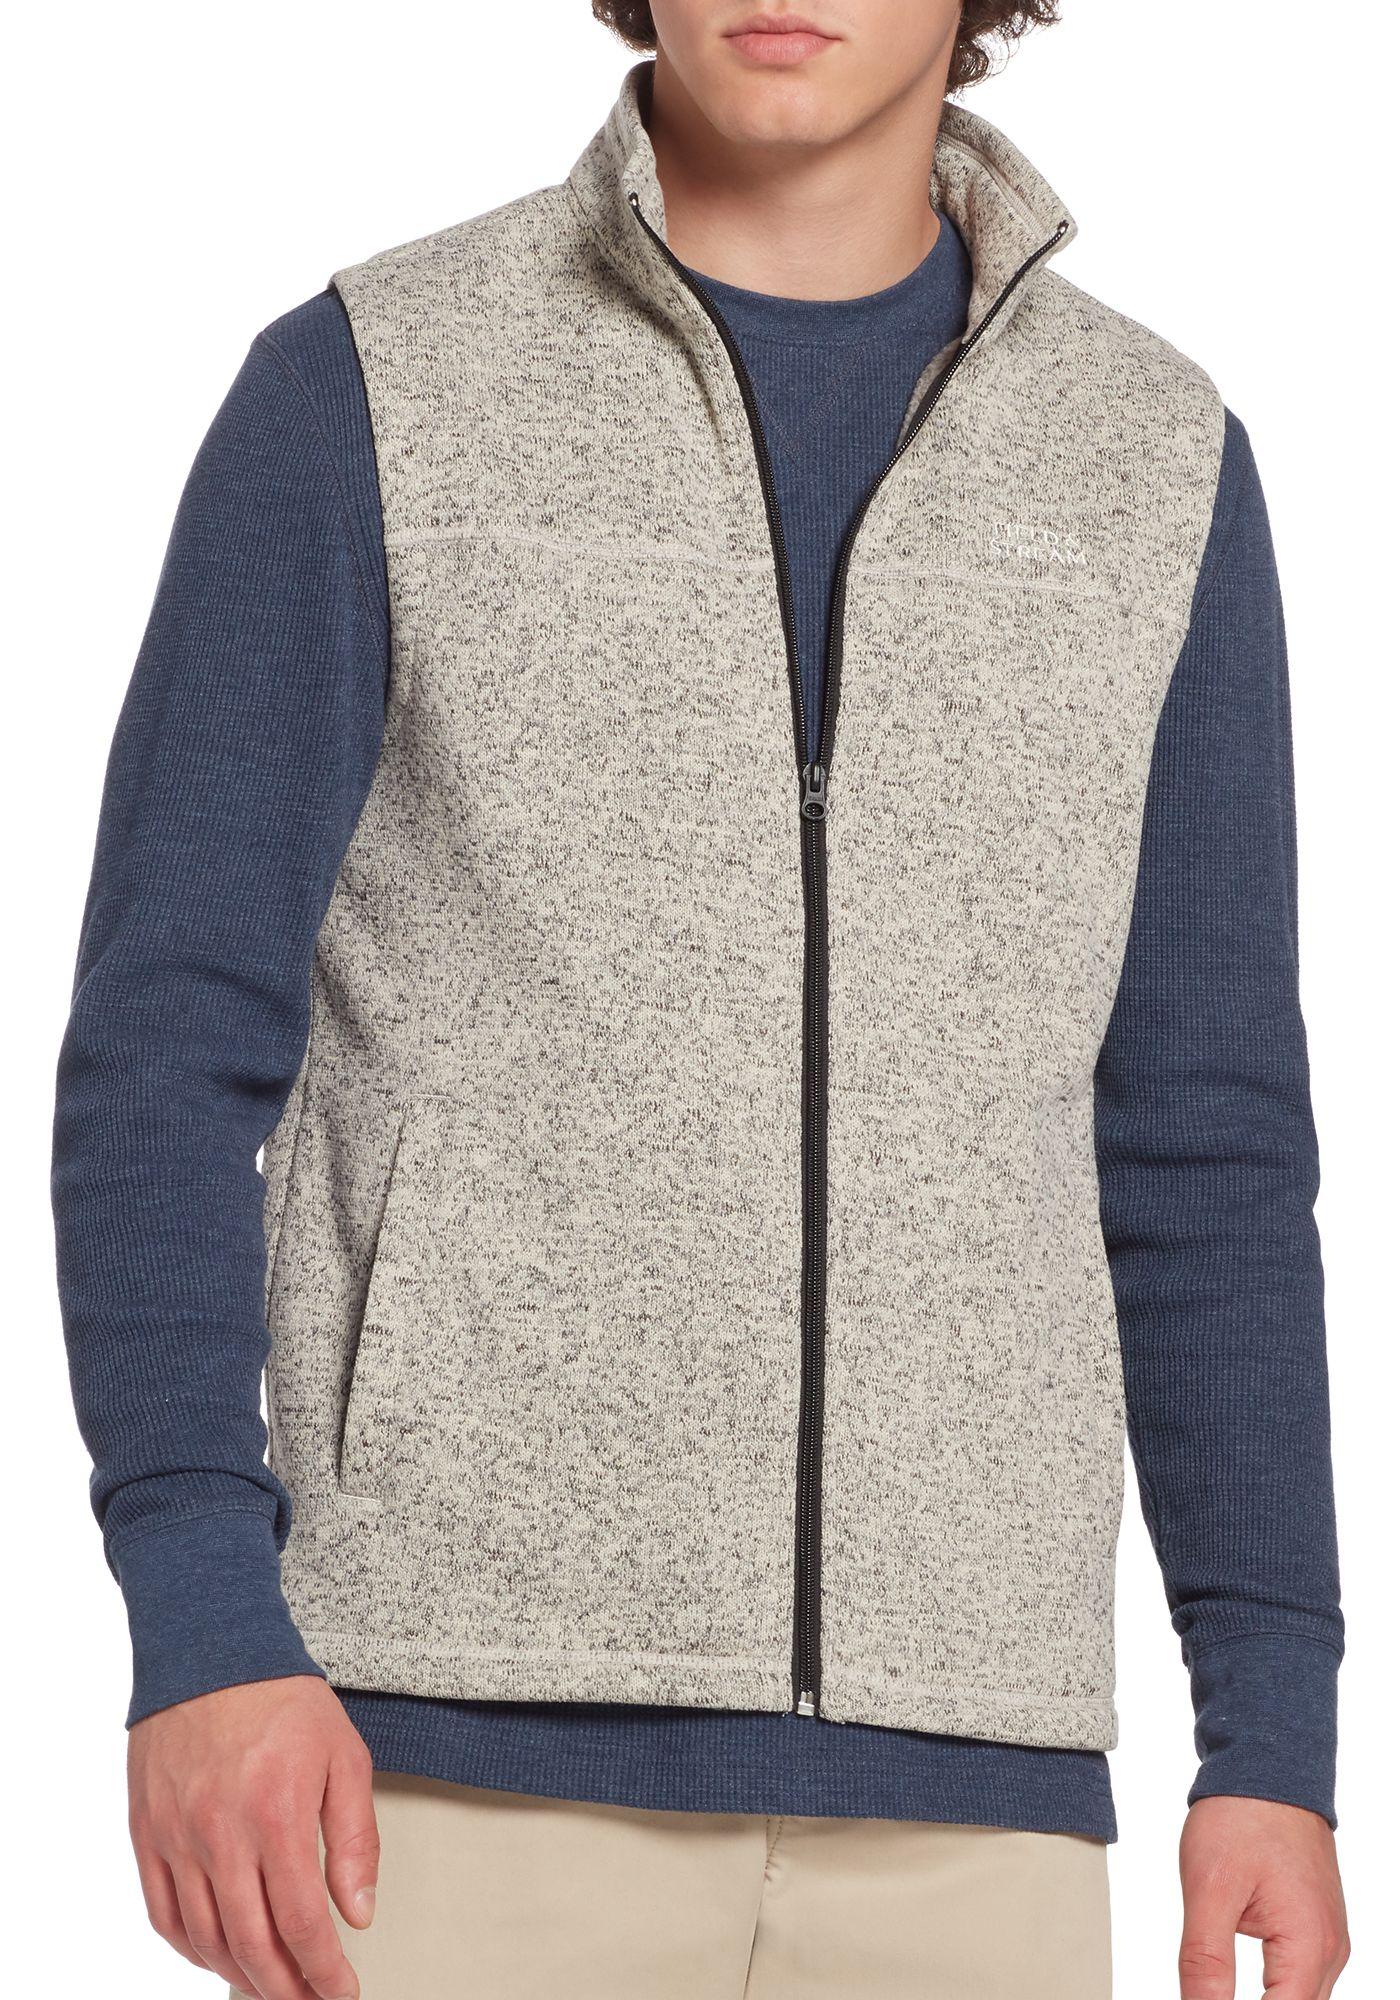 Field & Stream Men's Fleece Sweater Vest